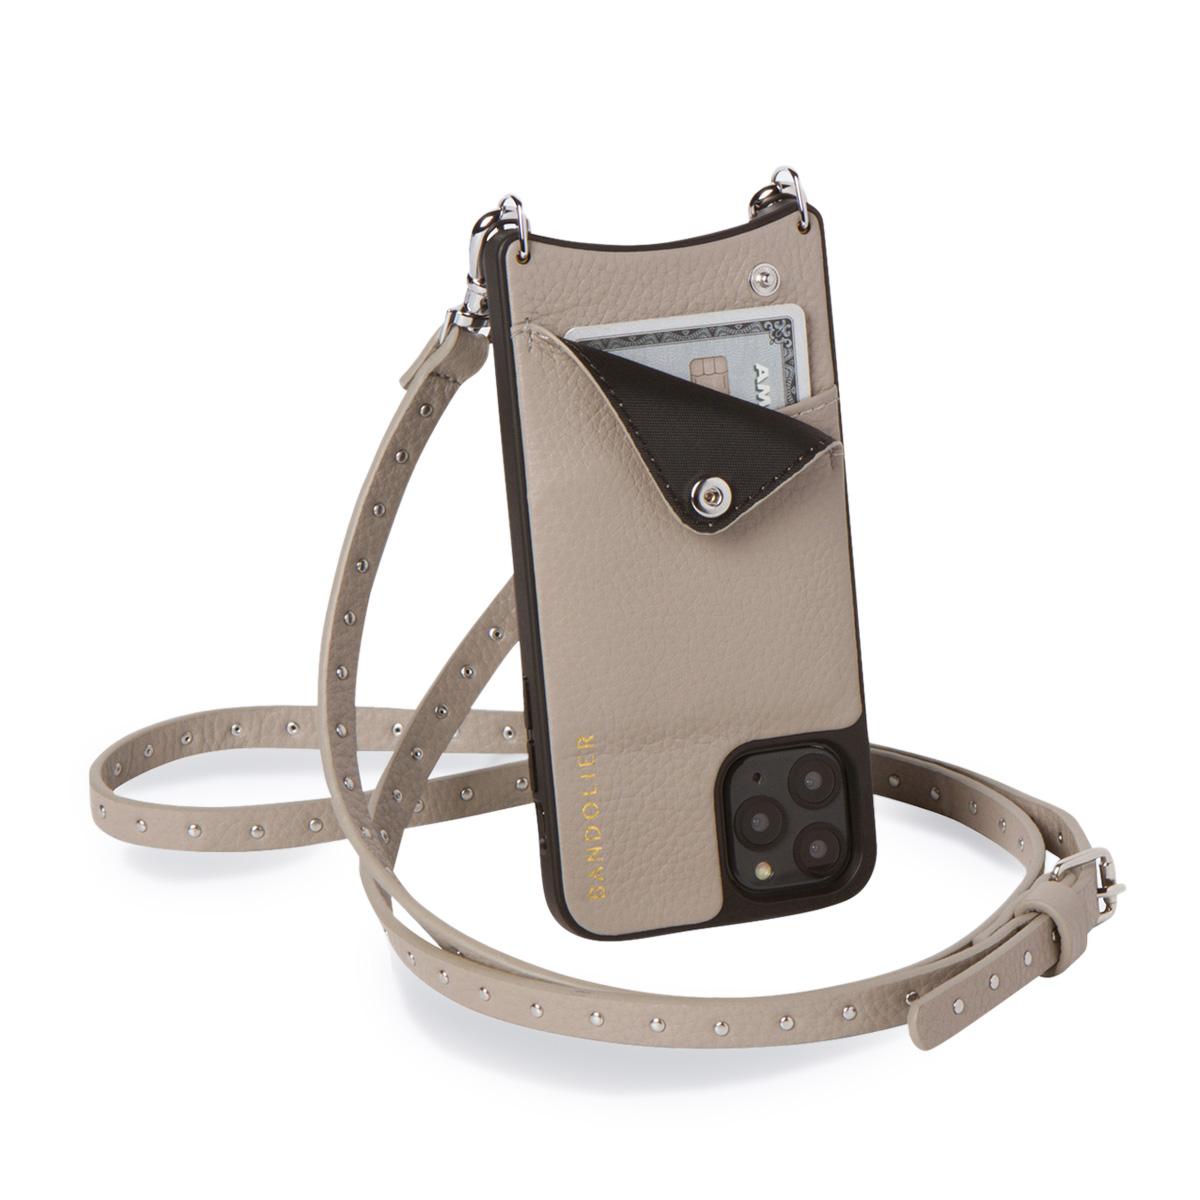 BANDOLIER NICOLE GREGE バンドリヤー iPhone XR ケース スマホ 携帯 ショルダー アイフォン メンズ レディース レザー グレー 10NIC